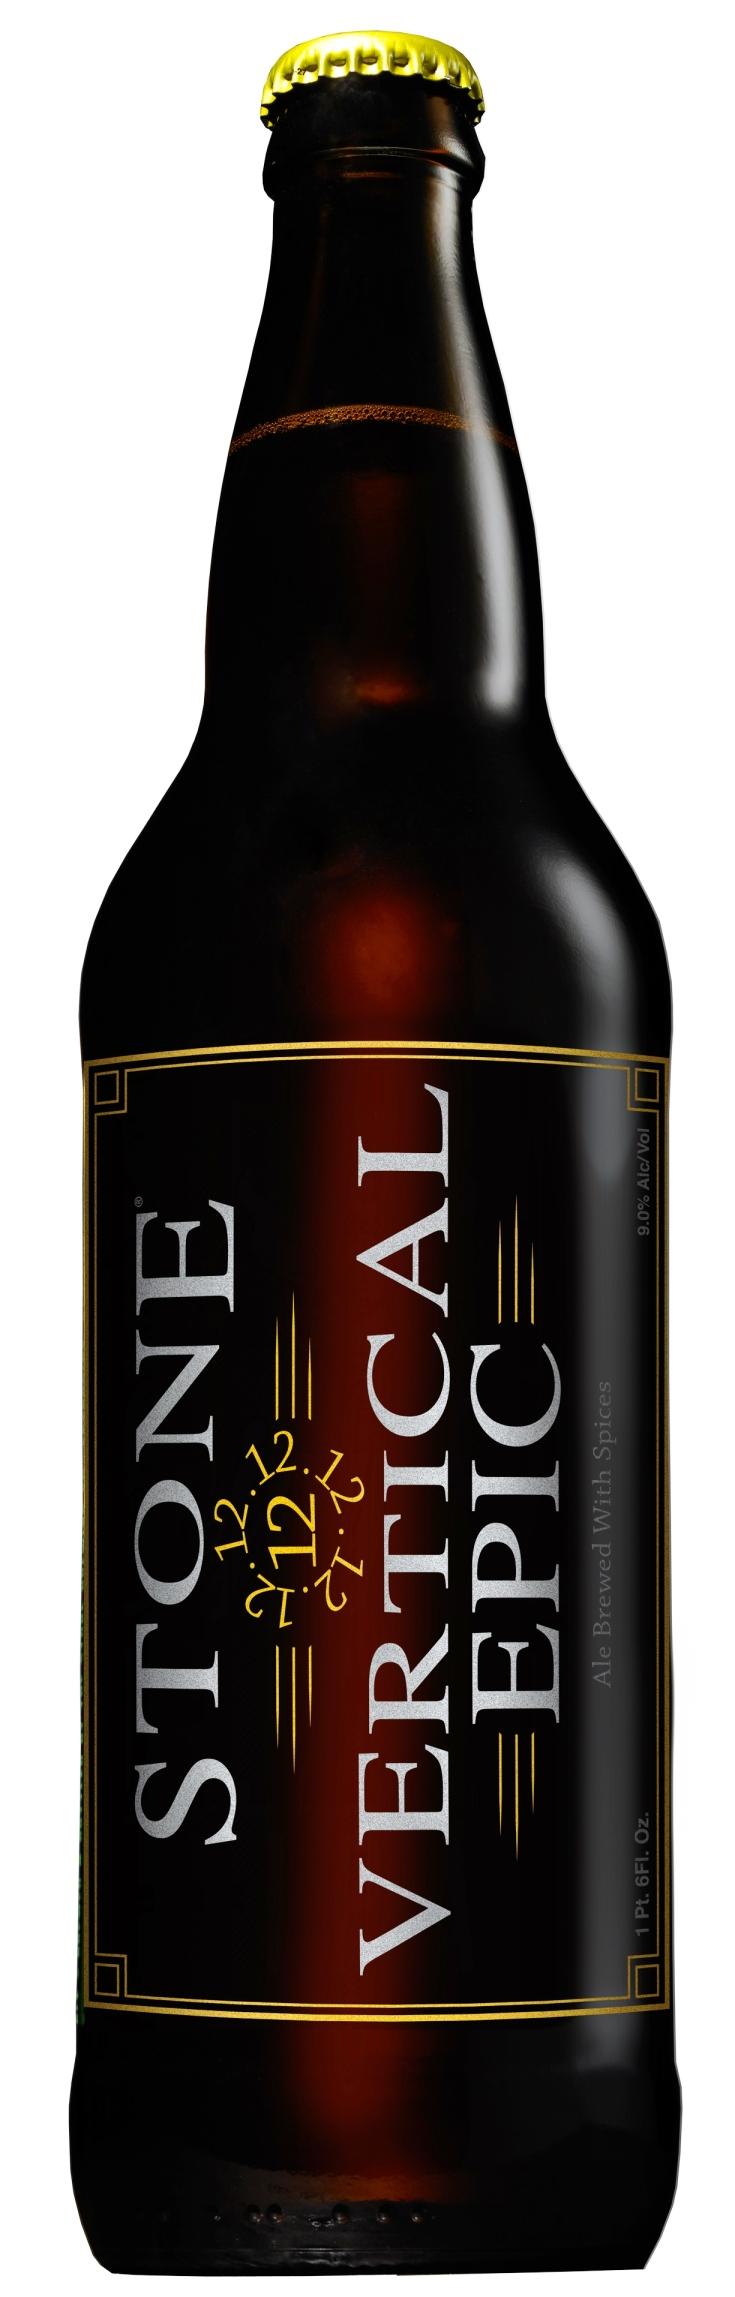 Vertical Epic 12-12-12, Stone Brewing Company, Escondido, Northern San Diego County, CA